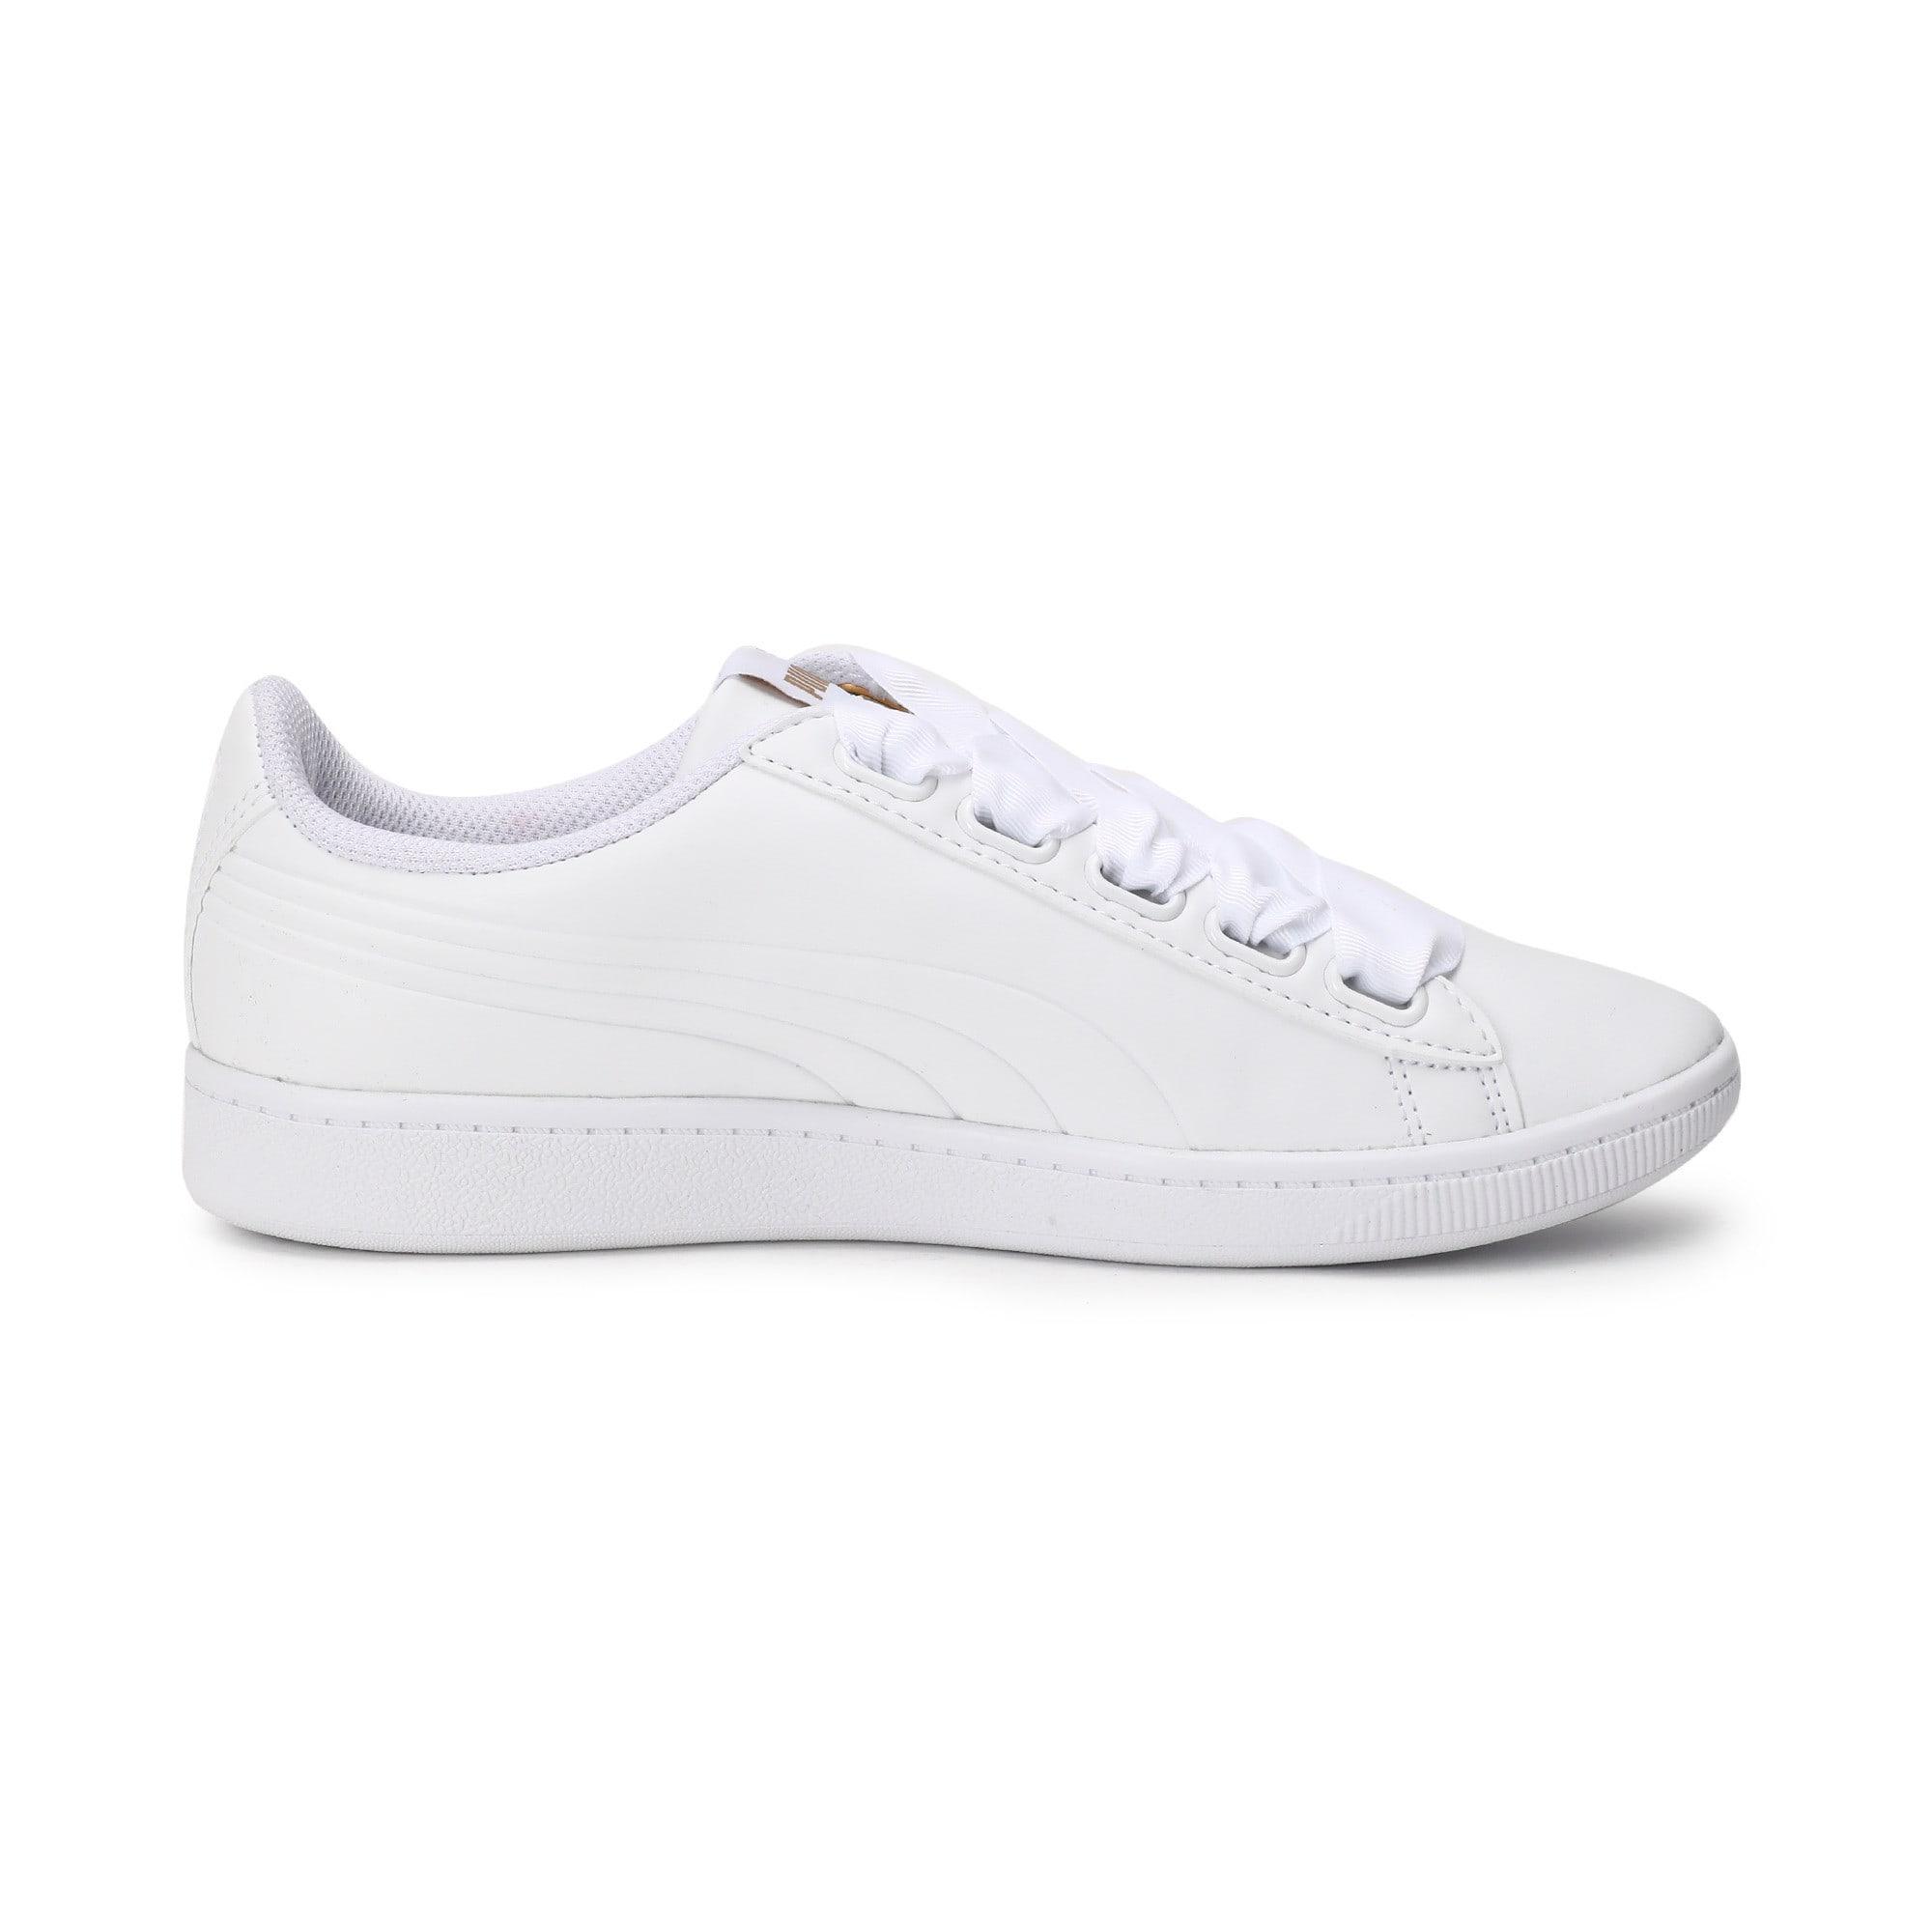 Thumbnail 5 of Women's Puma Vikky Ribbon Sneakers, Puma White-Puma White, medium-IND